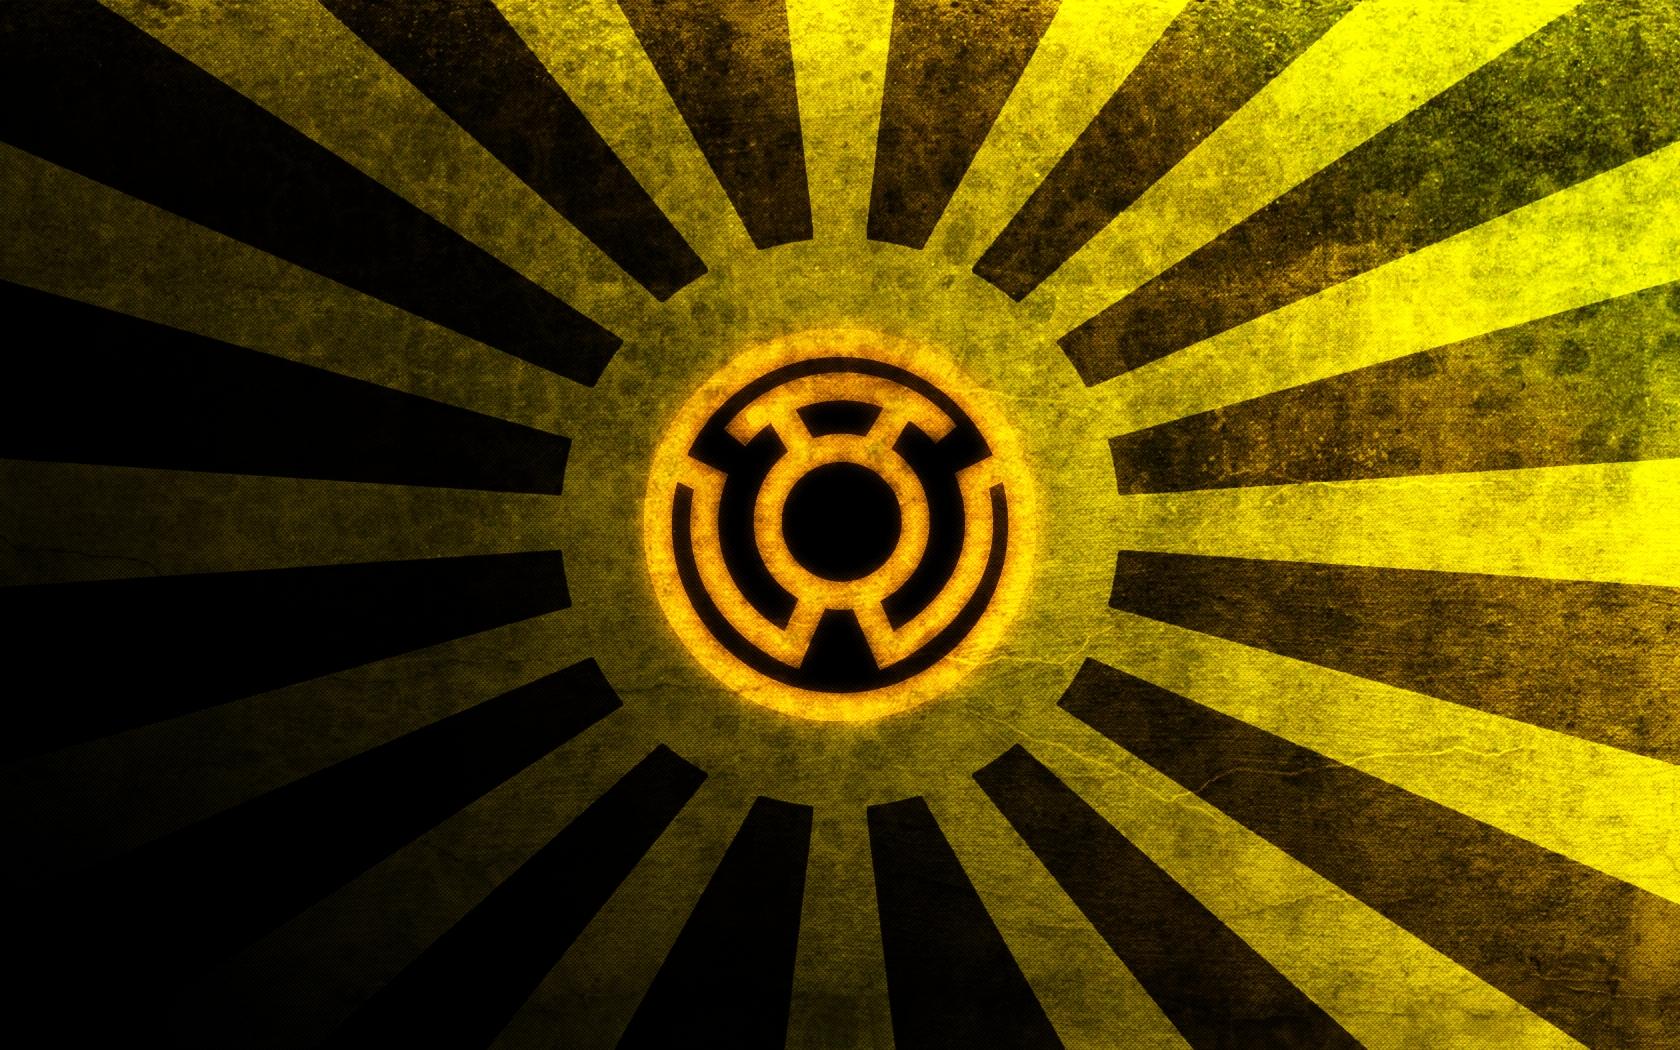 Best 45 Sinestro Corps Wallpaper on HipWallpaper Marine Corps 1680x1050